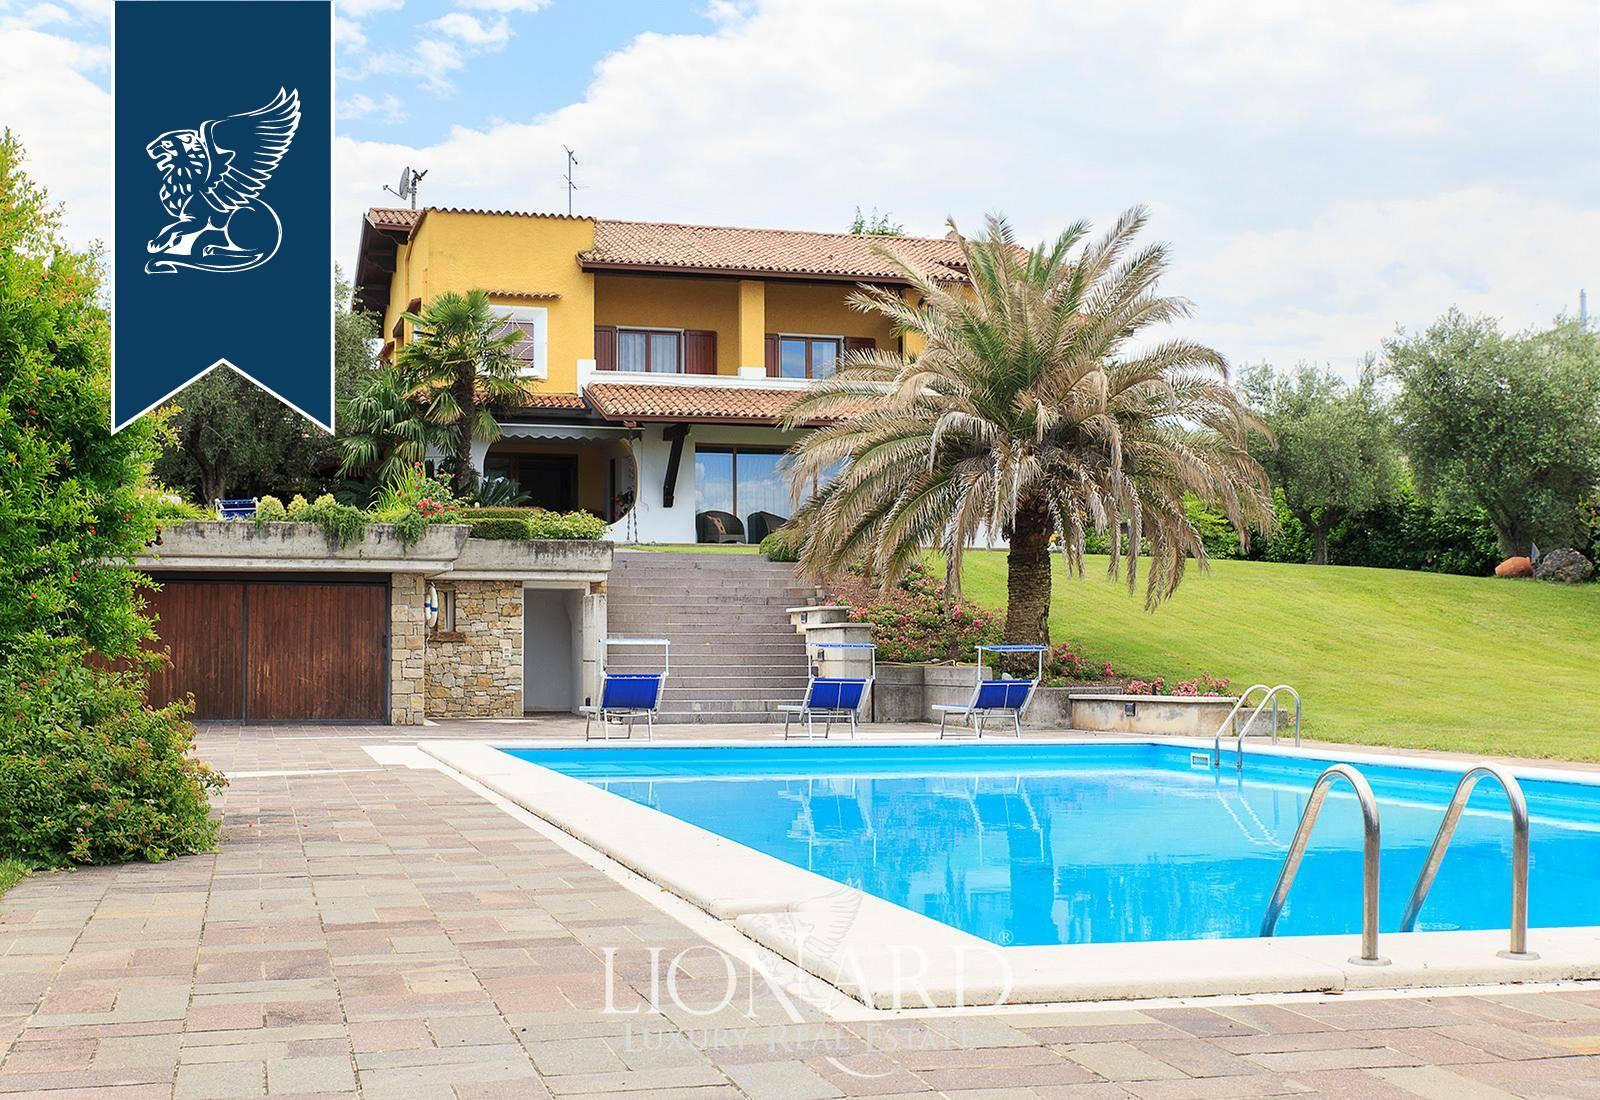 Villa in Vendita a Padenghe Sul Garda: 0 locali, 800 mq - Foto 9